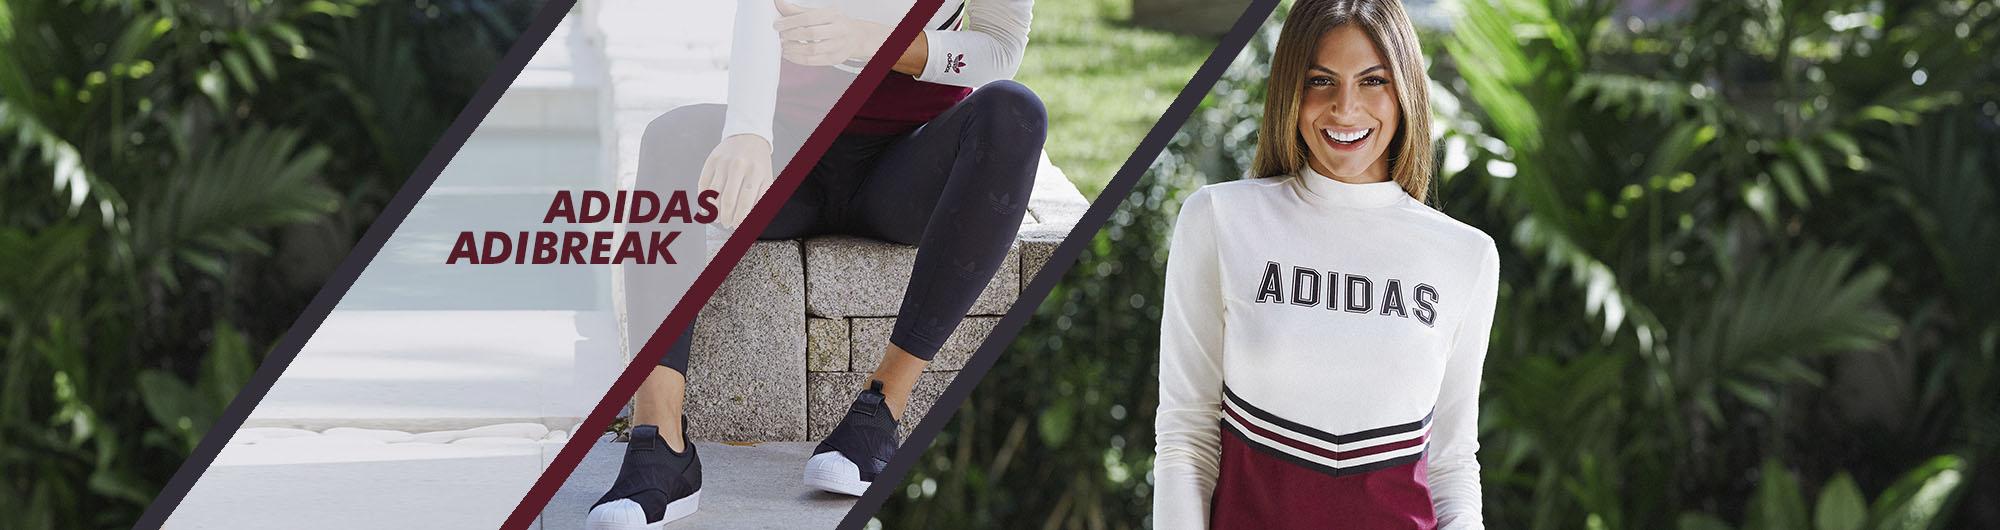 BTV2-adidas_Feminino